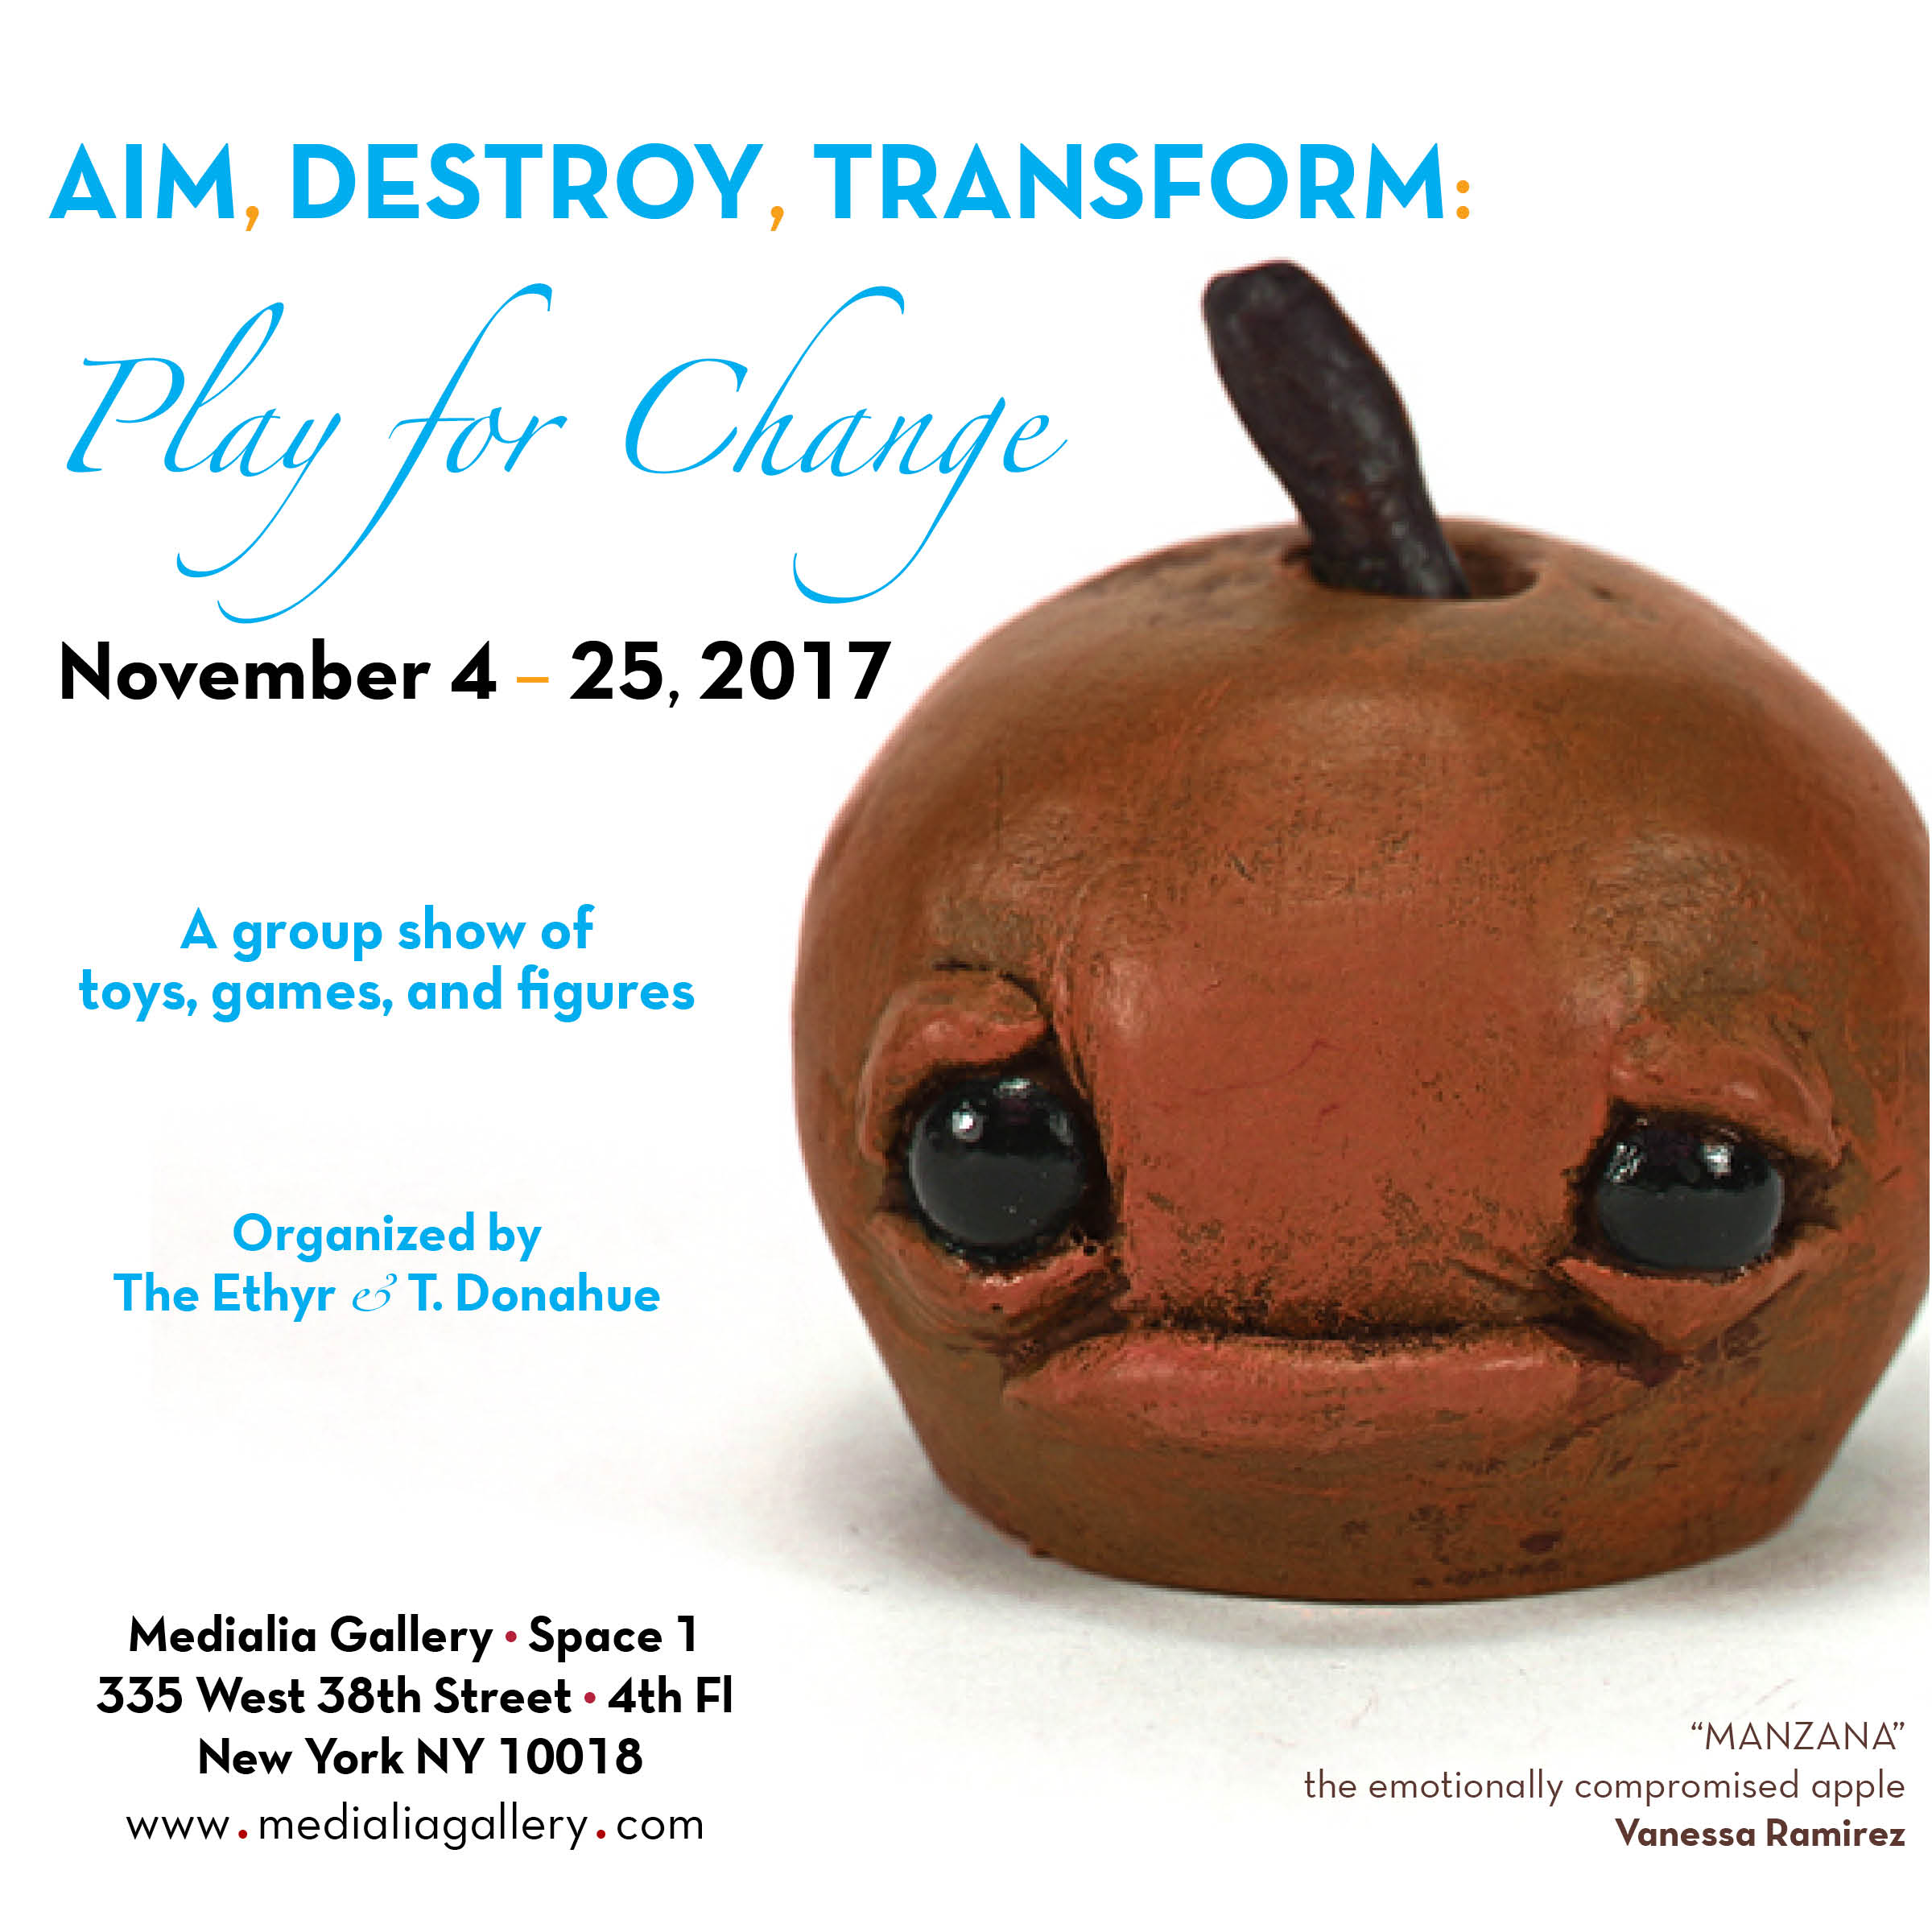 MedialiaGallery_The_Ethyr_AimDestroyTransform_Toy_Show_announcement_Manzana_November_2017_I.jpg.jpg